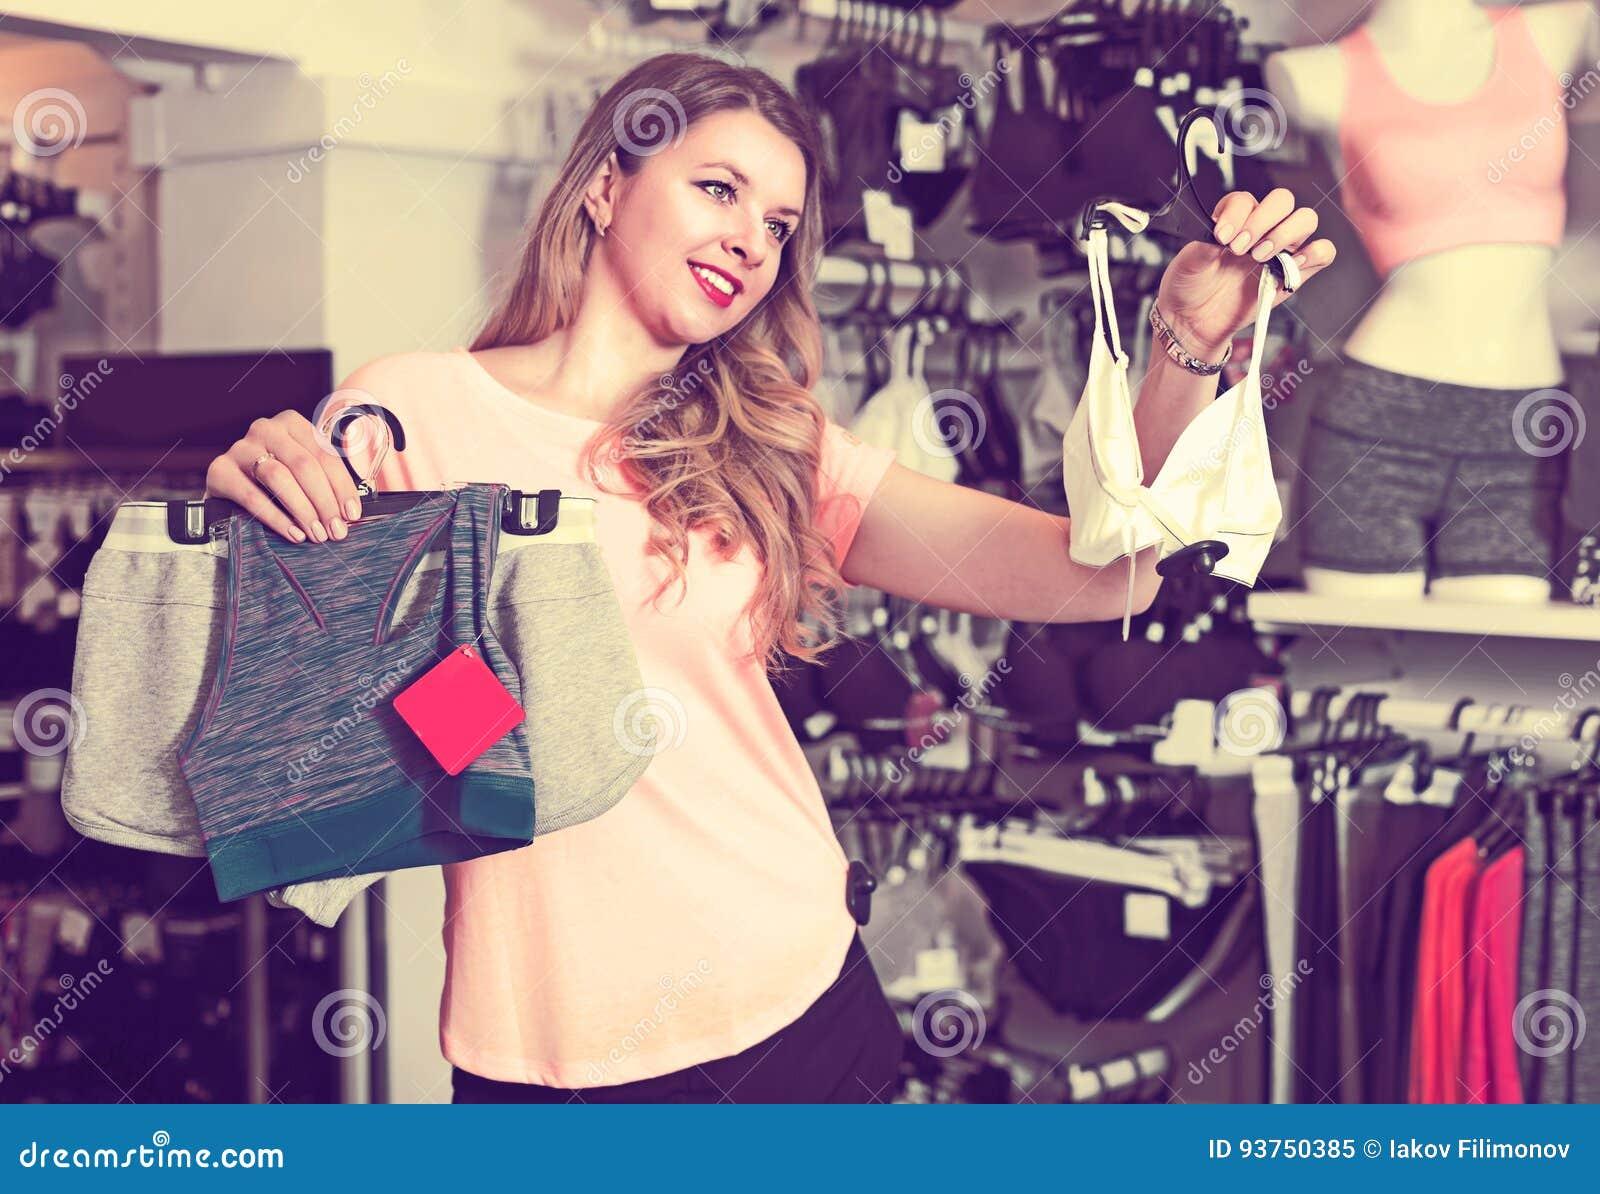 ce2634ae314 Female Customer Is Choosing Sports Underwear Stock Image - Image of ...